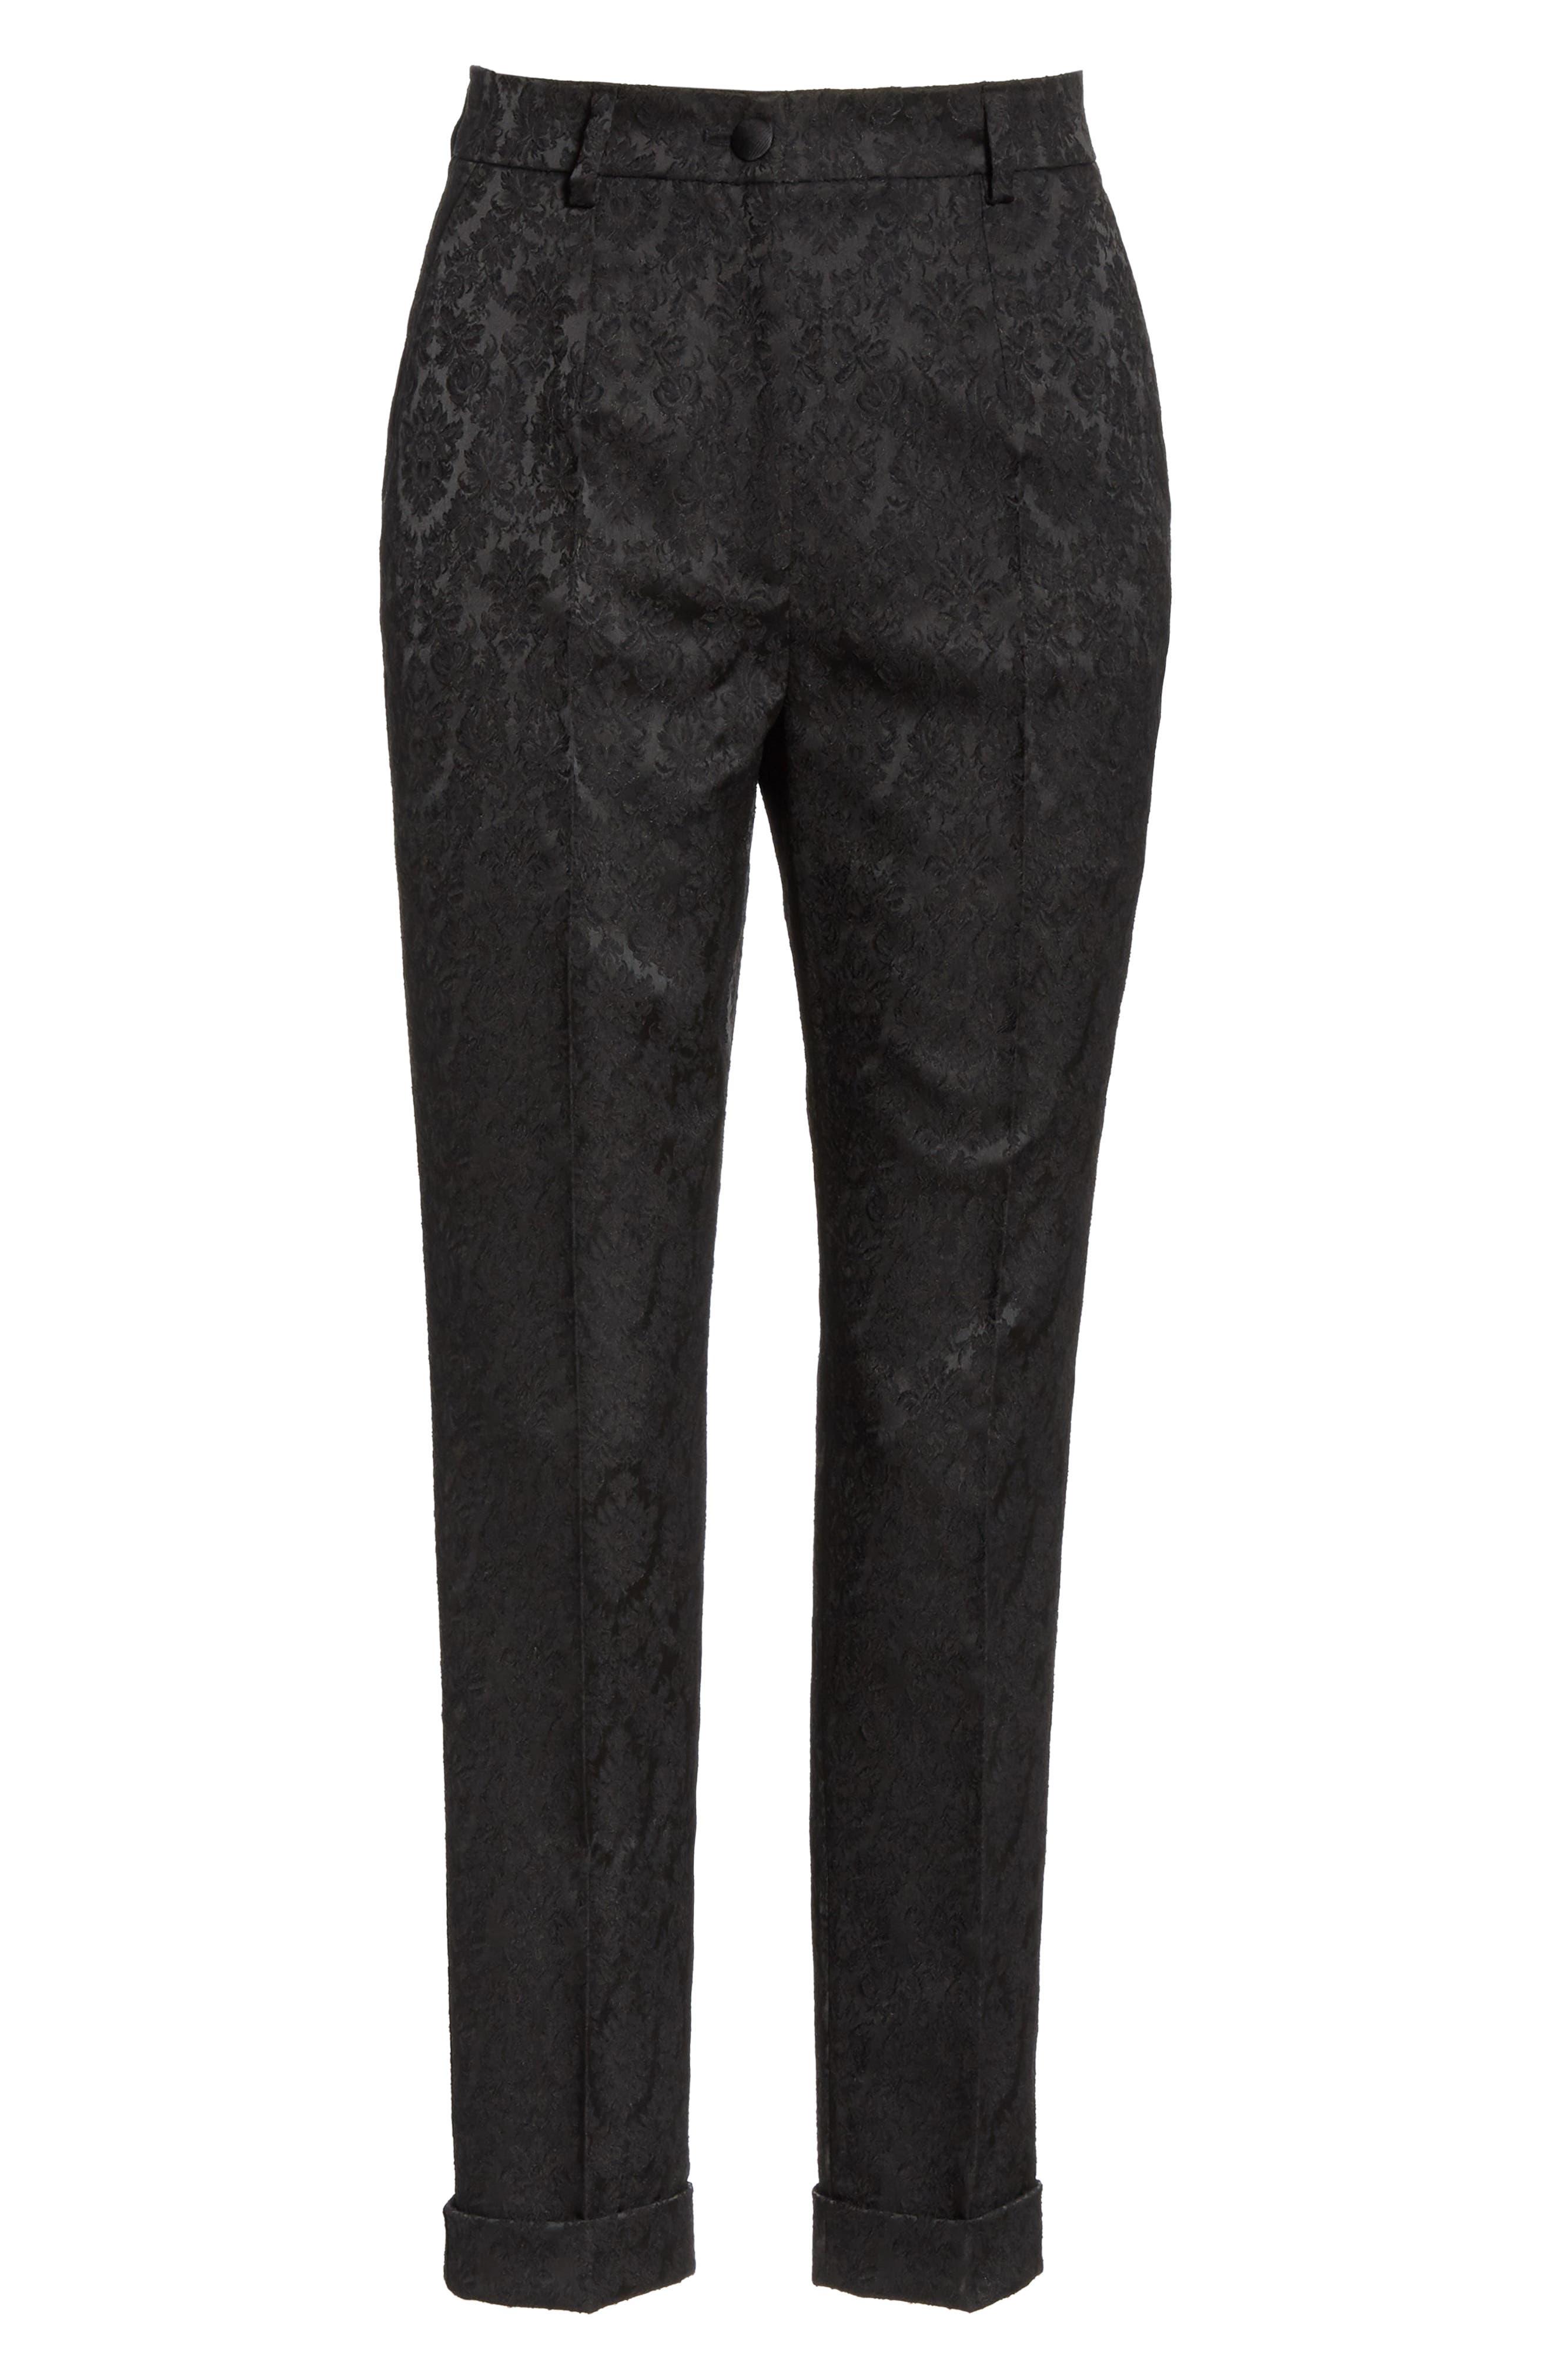 Jacquard Cuff Skinny Pants,                             Alternate thumbnail 6, color,                             N0000 BLACK